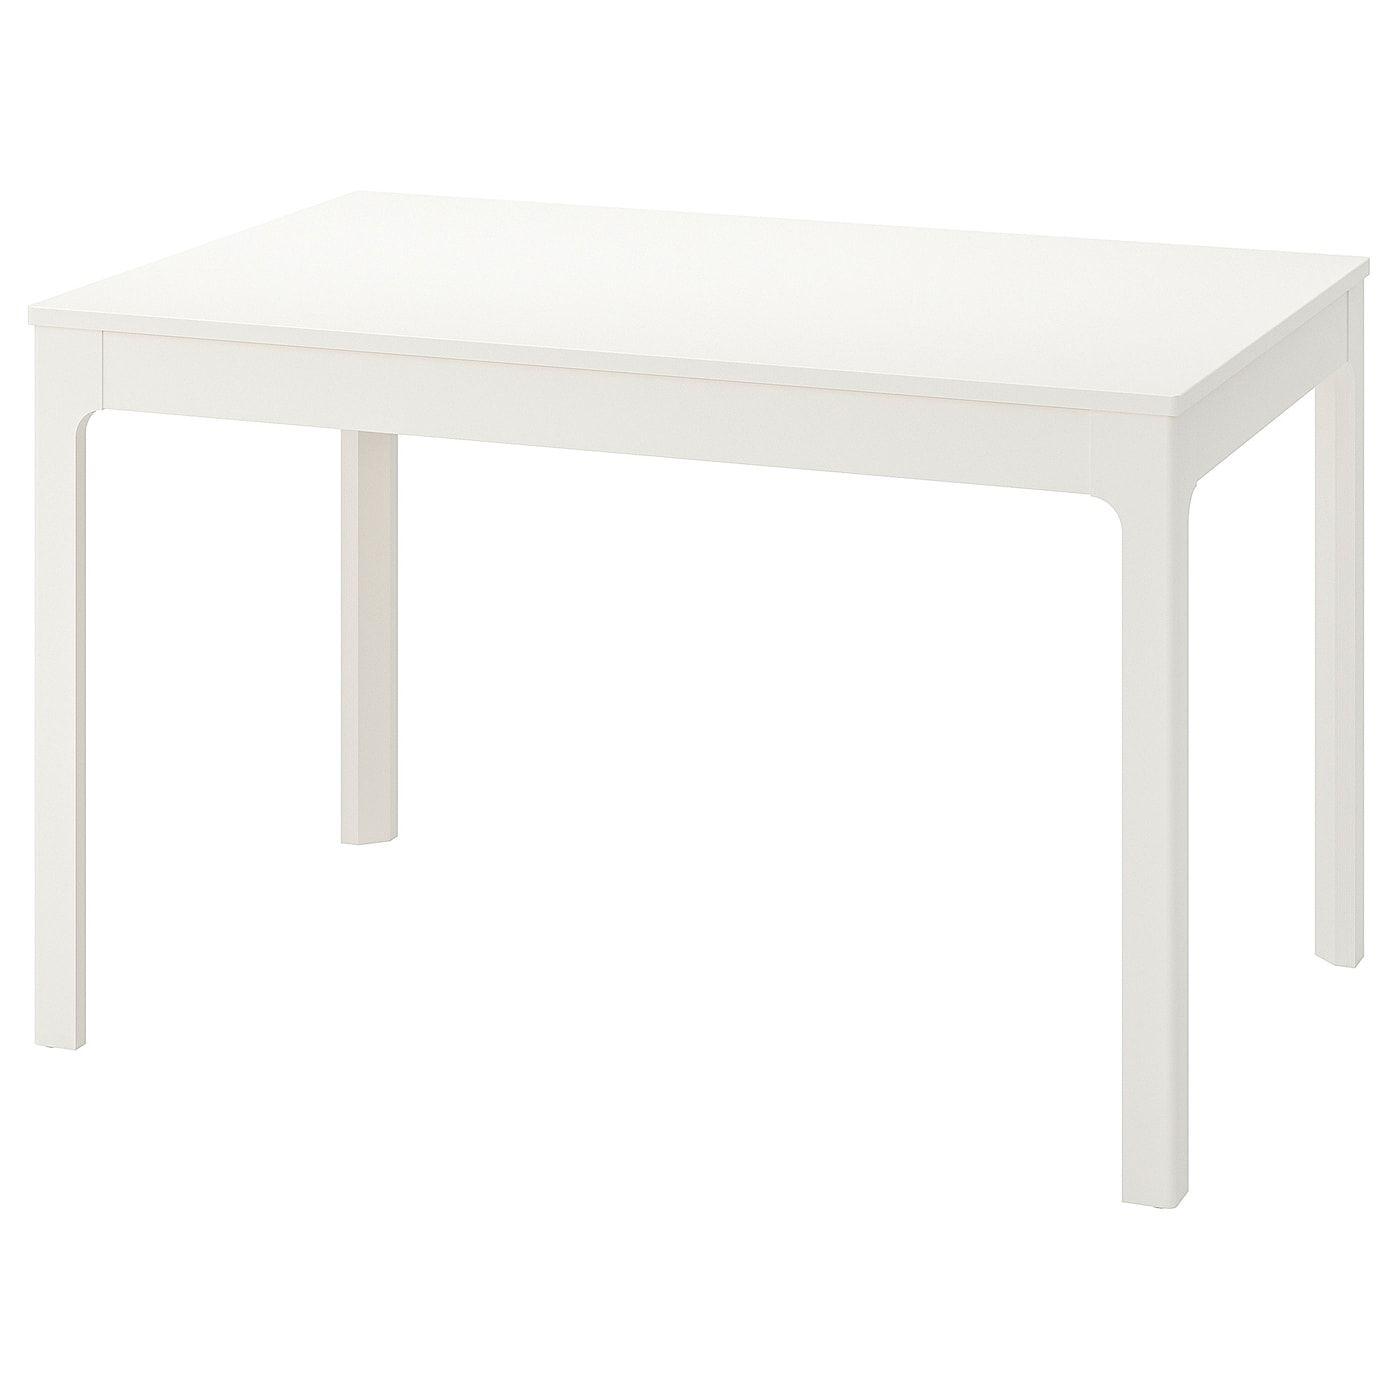 Ekedalen Extendable Table White 120 180x80 Cm Table Ikea Dining Table